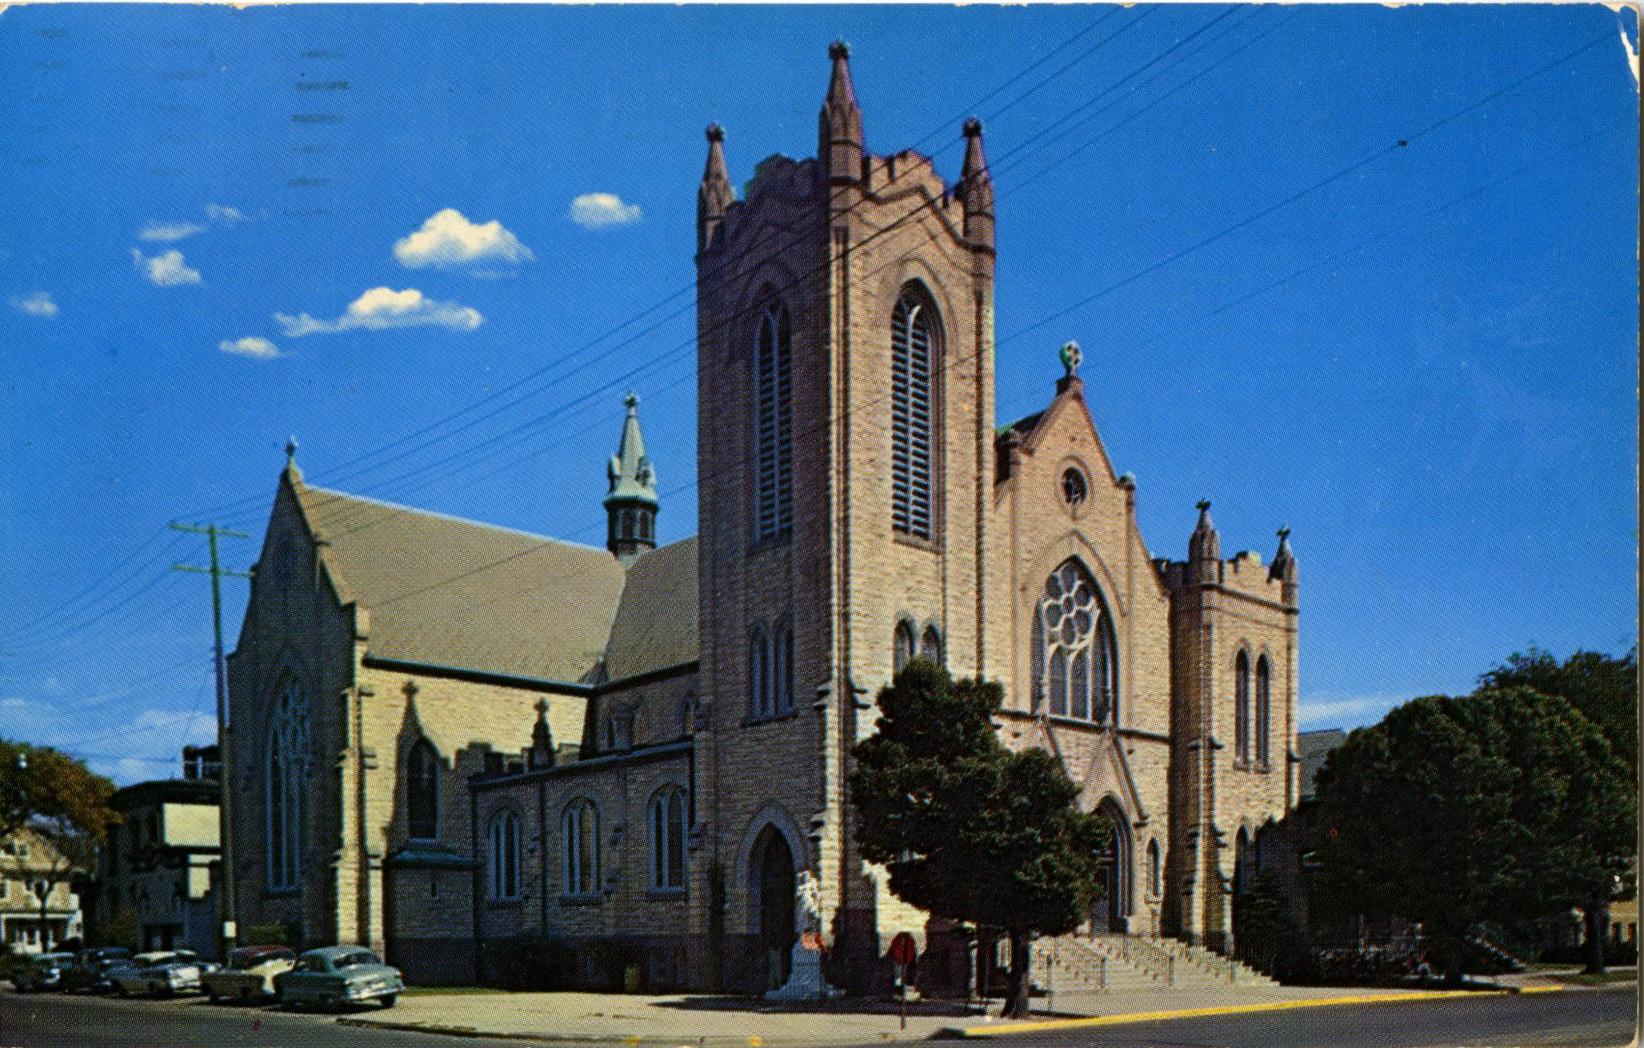 St. Joseph's Church, c. 1965.